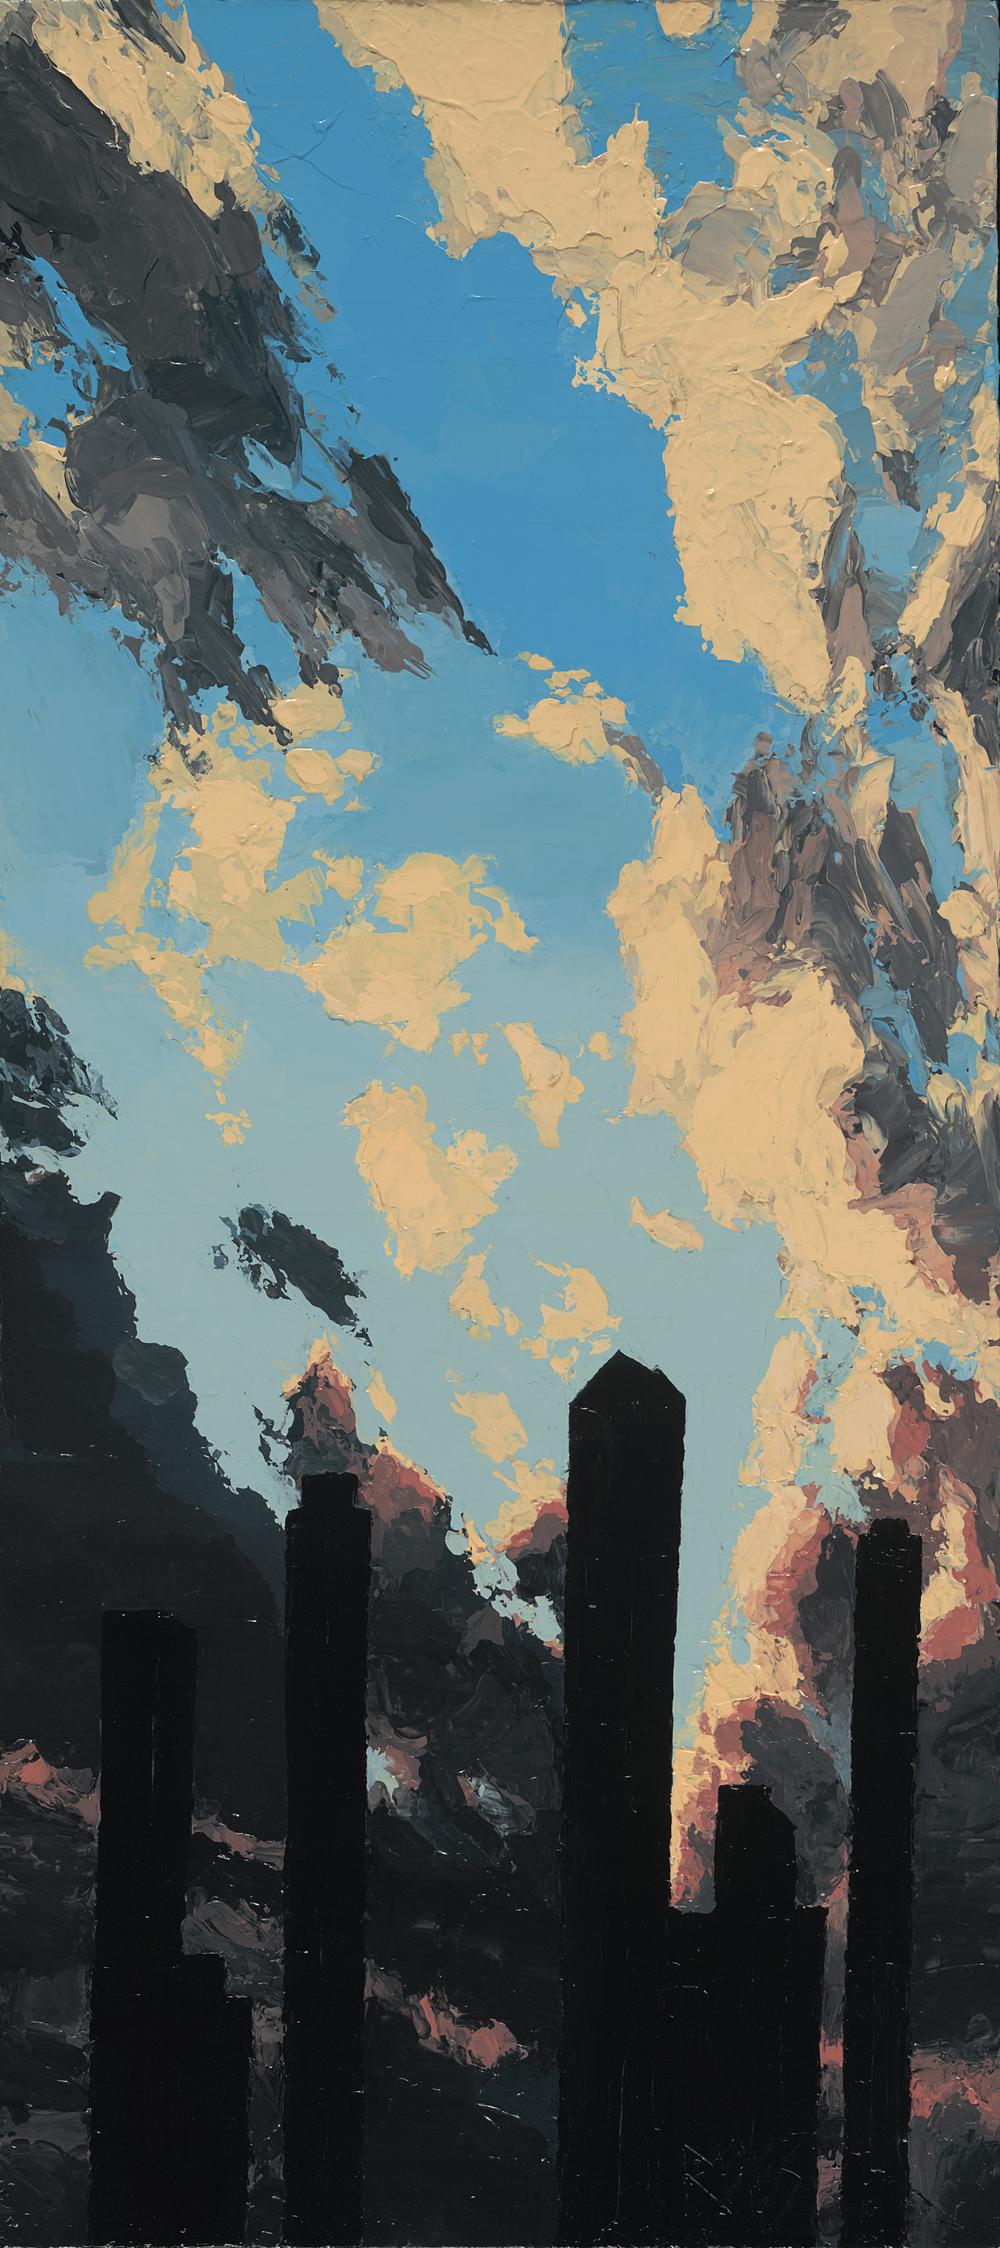 LA Skyline No. 1 (Dawn)